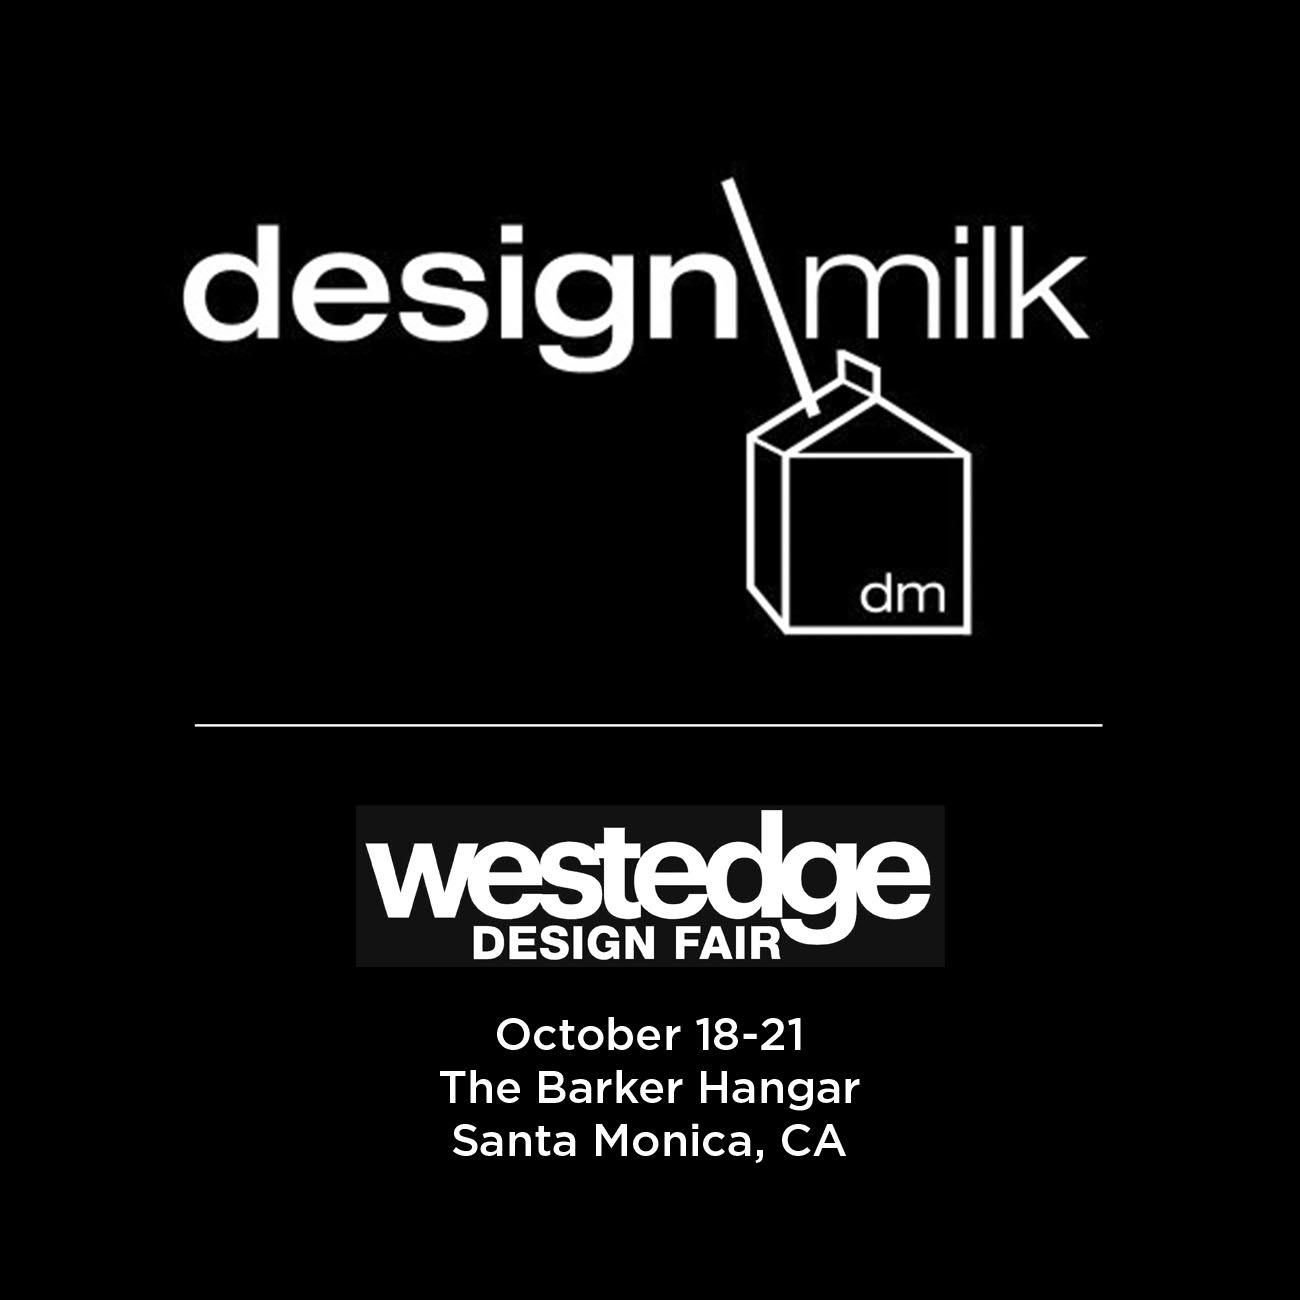 bc276516 Sunshine + Modern Design: The Milk Stand Returns to WestEdge in Santa Monica